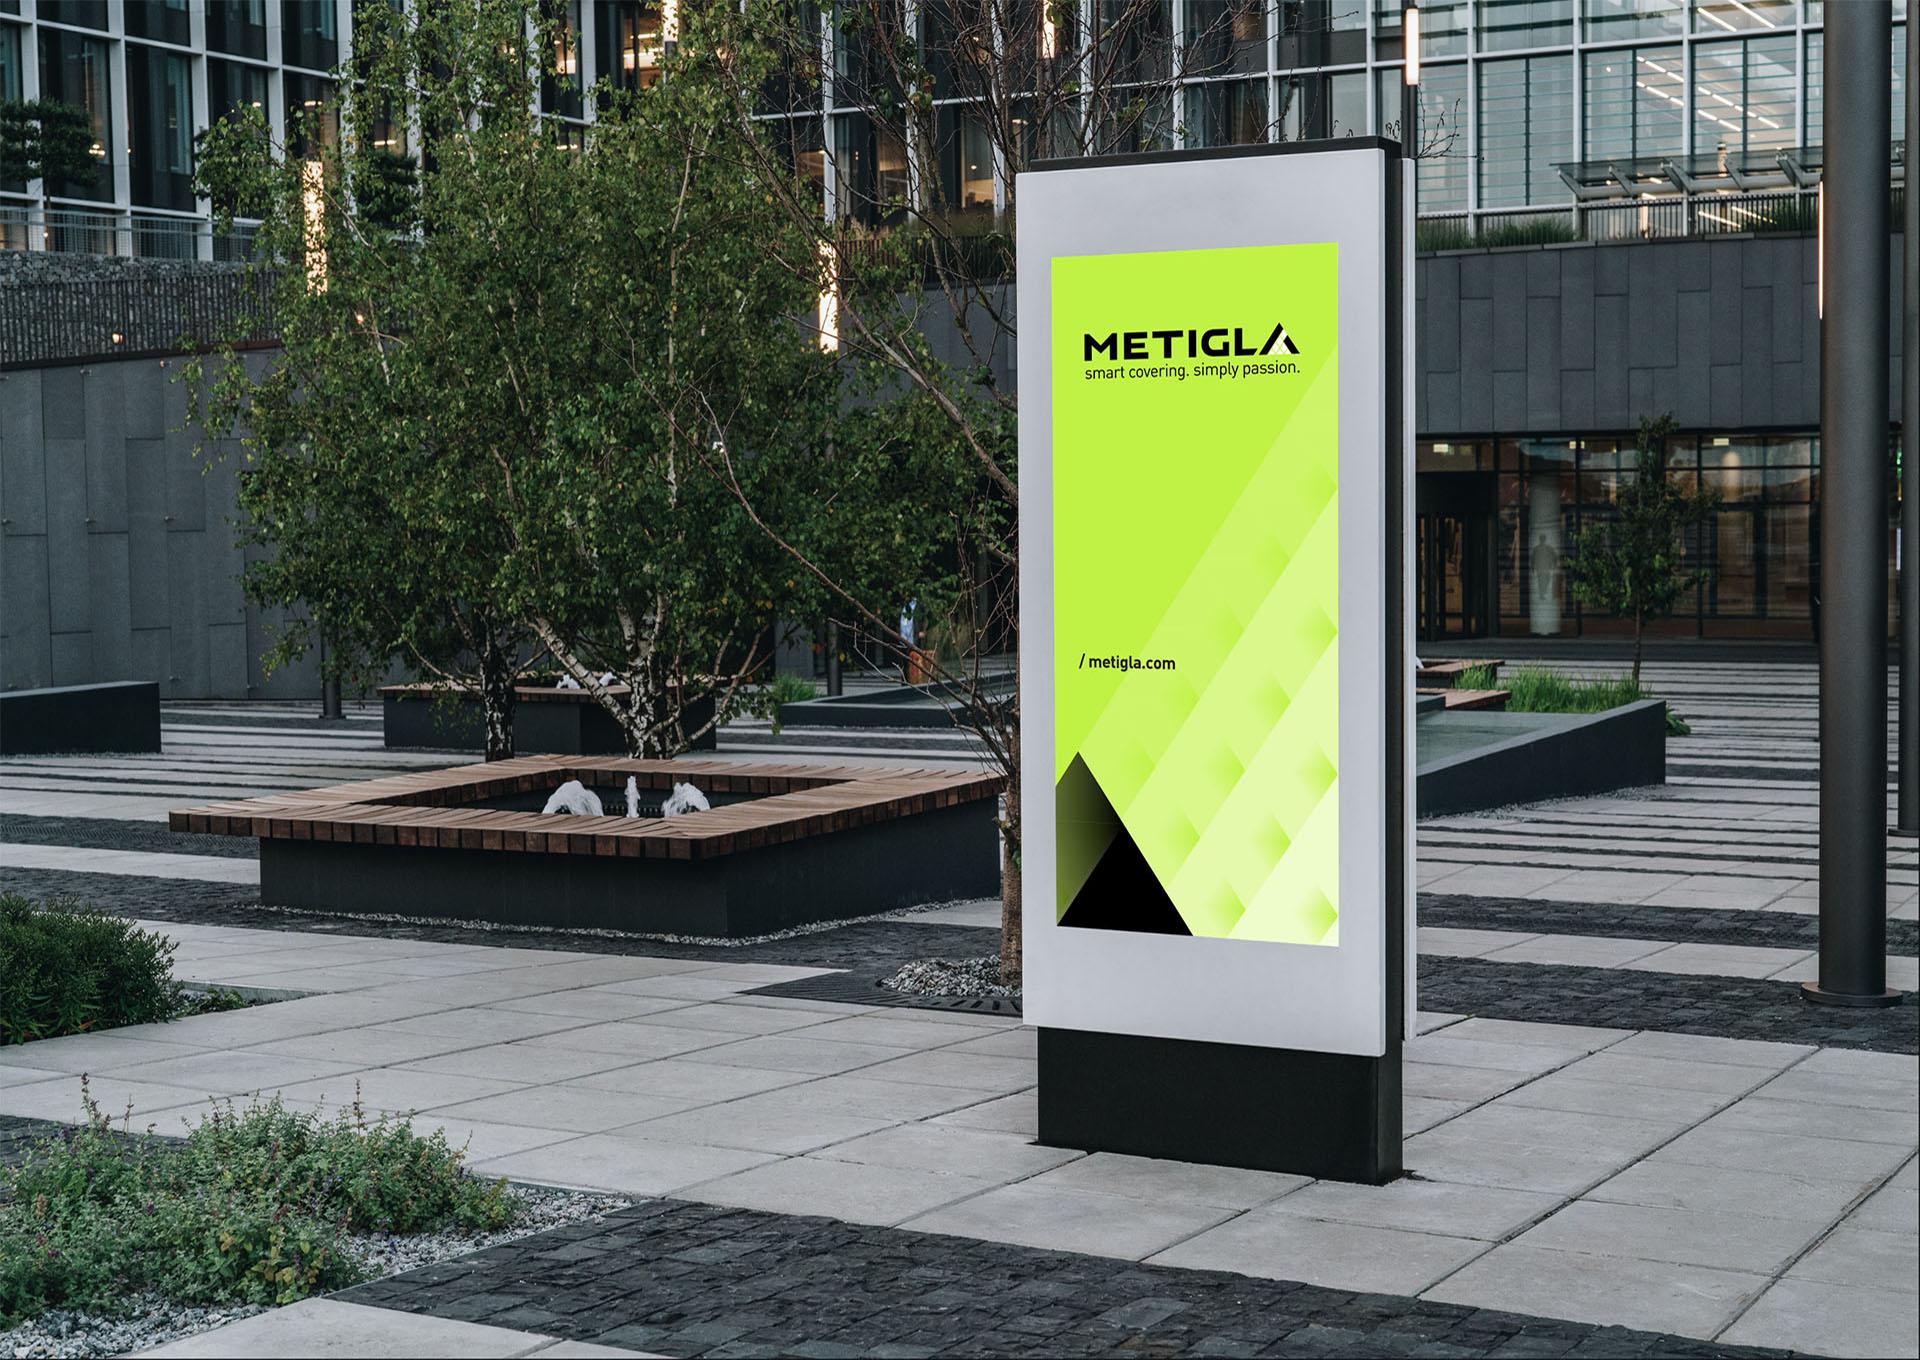 metigla branding outside